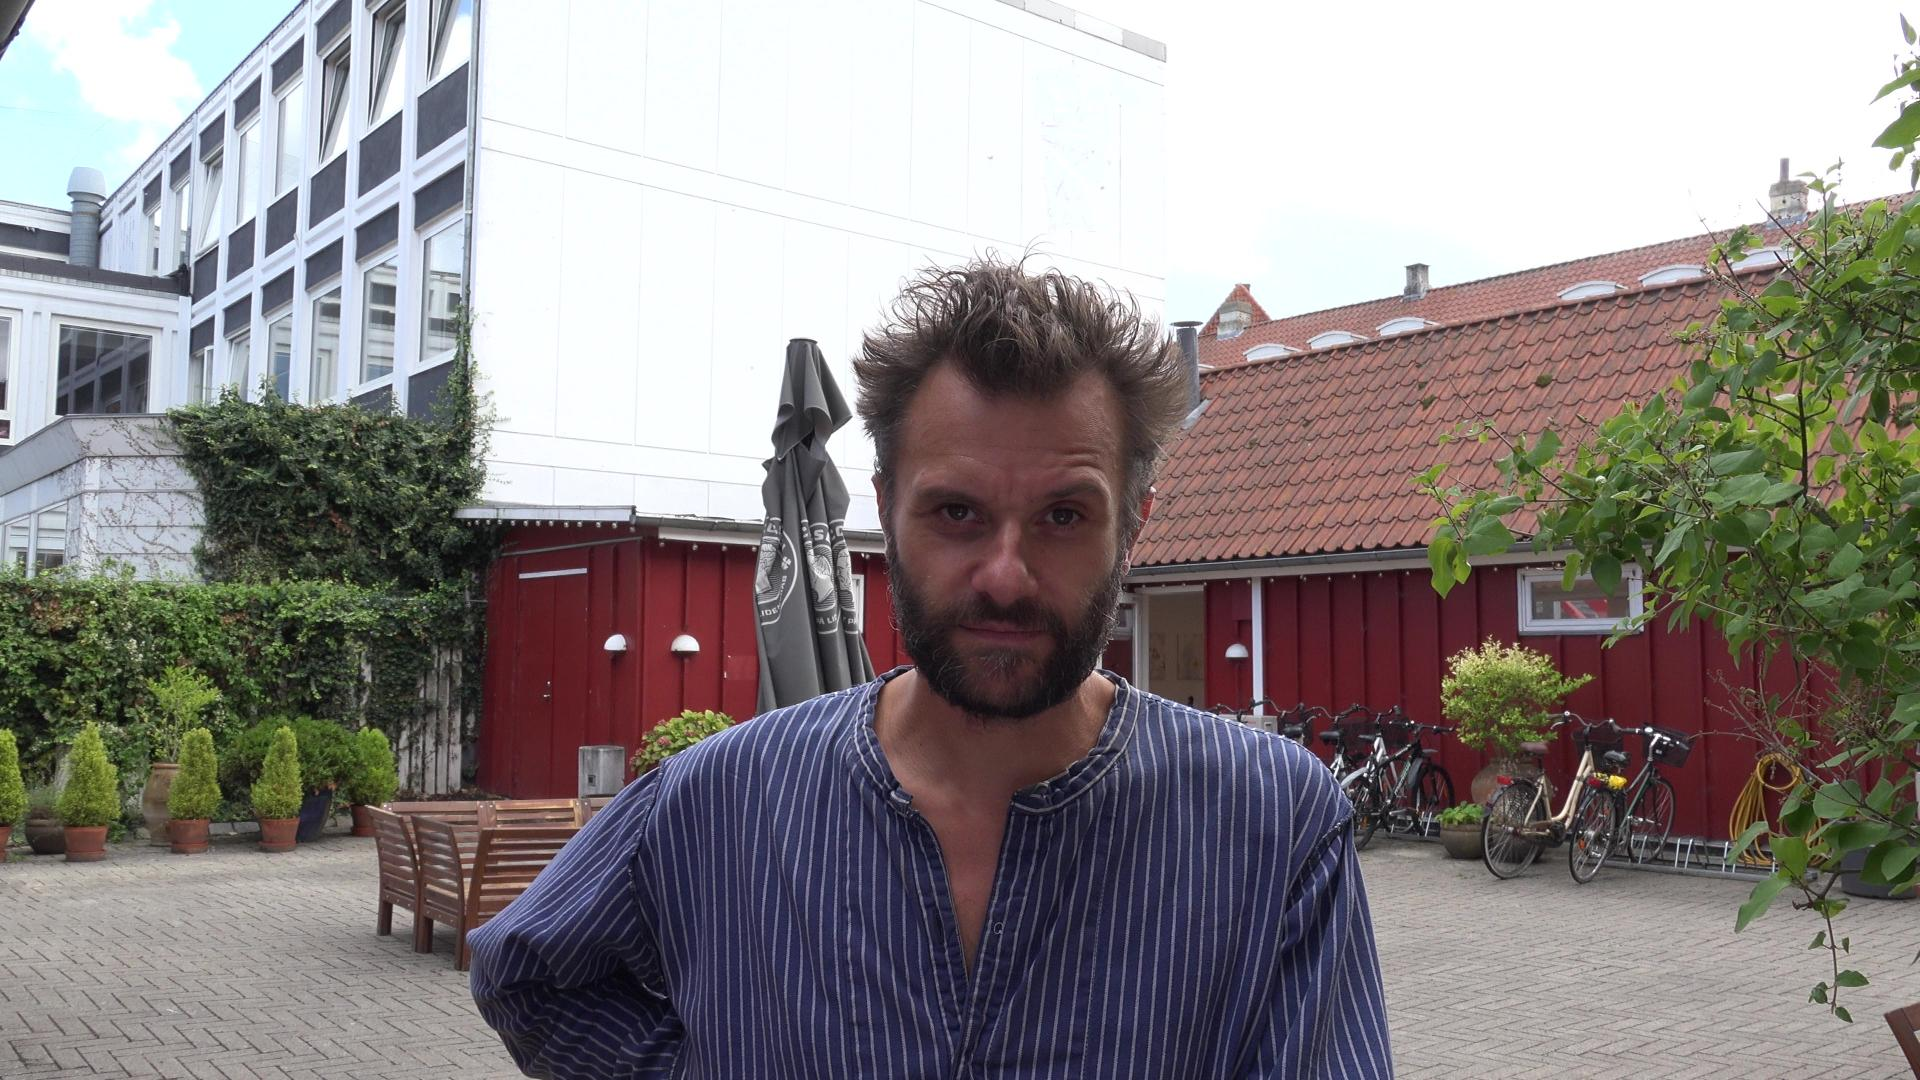 20180814_Holbæk Art_Thomas Poulsen-FOS_Torben Papillon-C0006_Moment-web